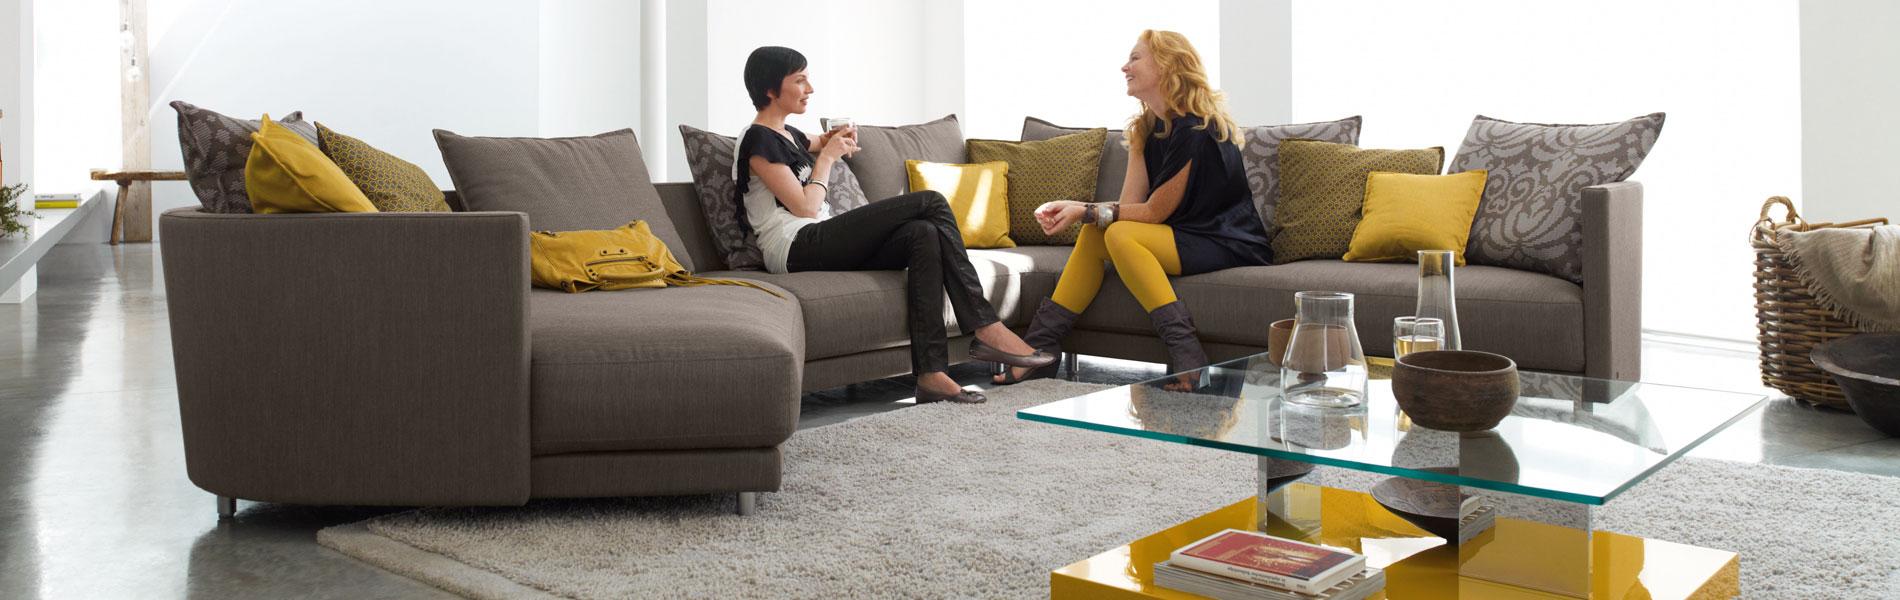 rolf benz onda kreative sitzlandschaft von m bel h ffner. Black Bedroom Furniture Sets. Home Design Ideas